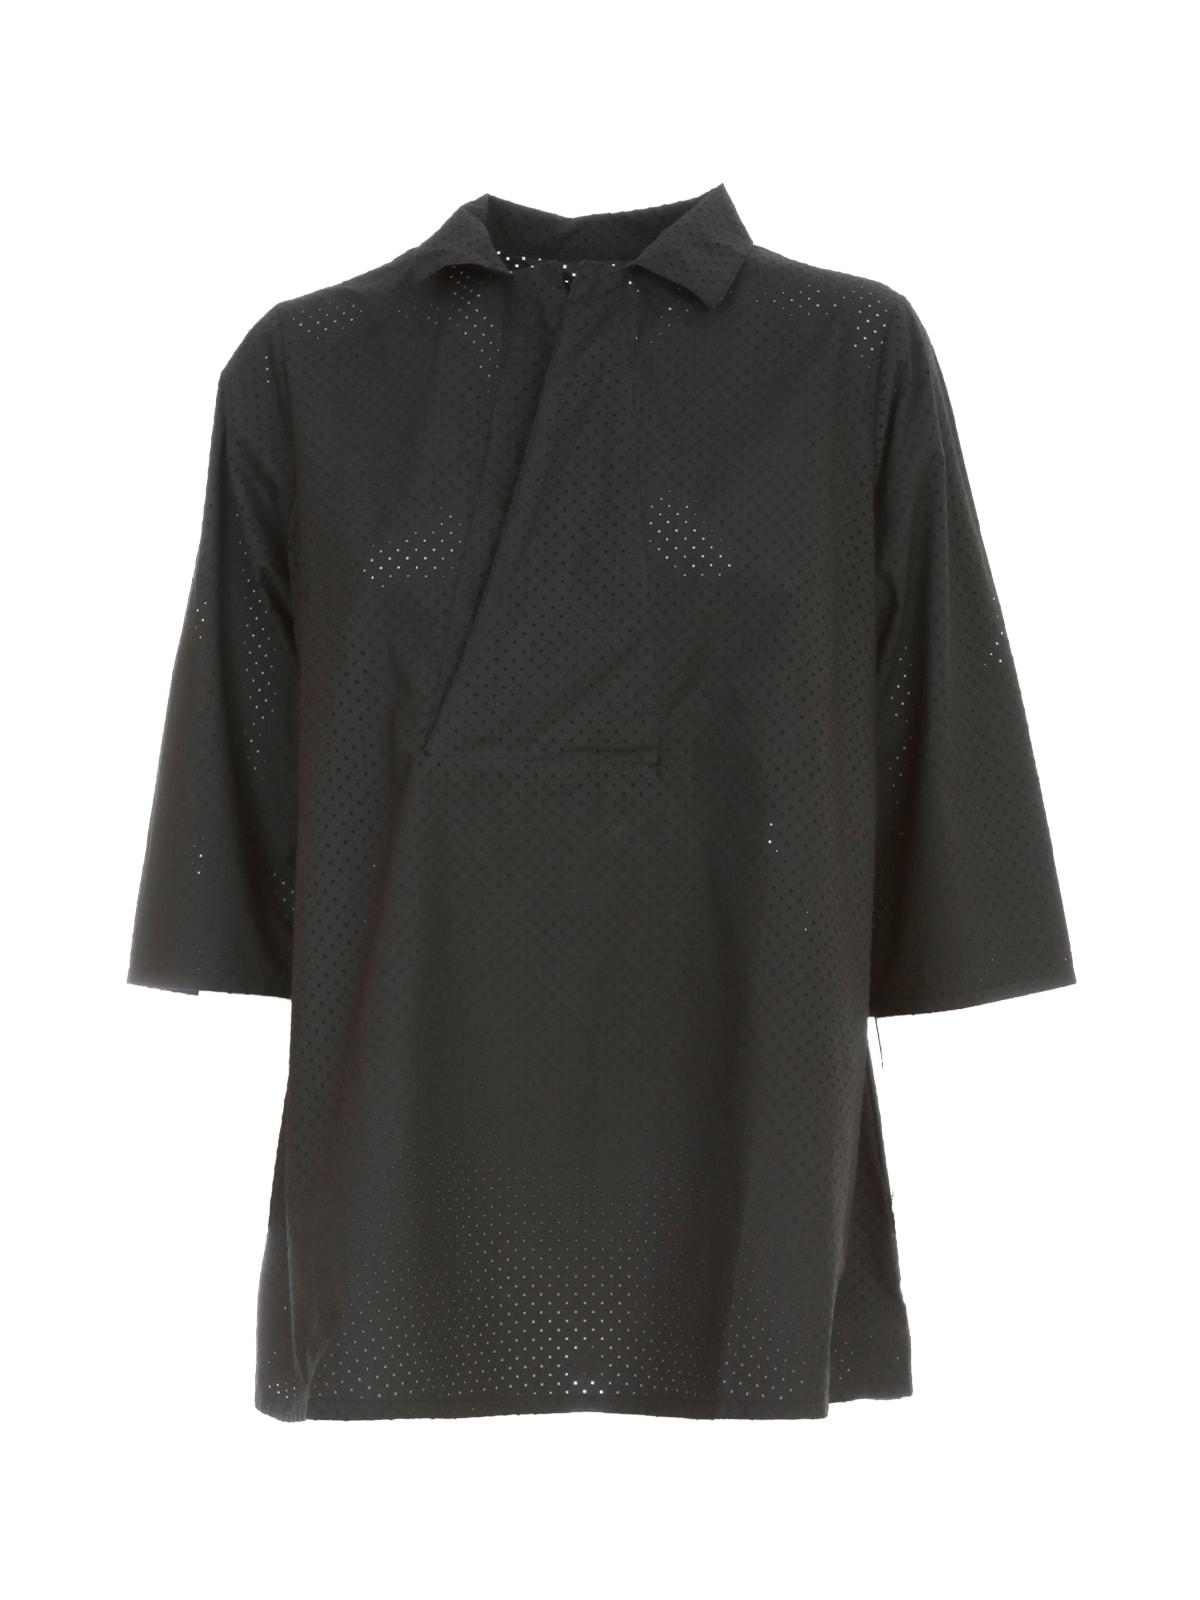 Labo. Art Shirt Revers Neck Drilled Textile